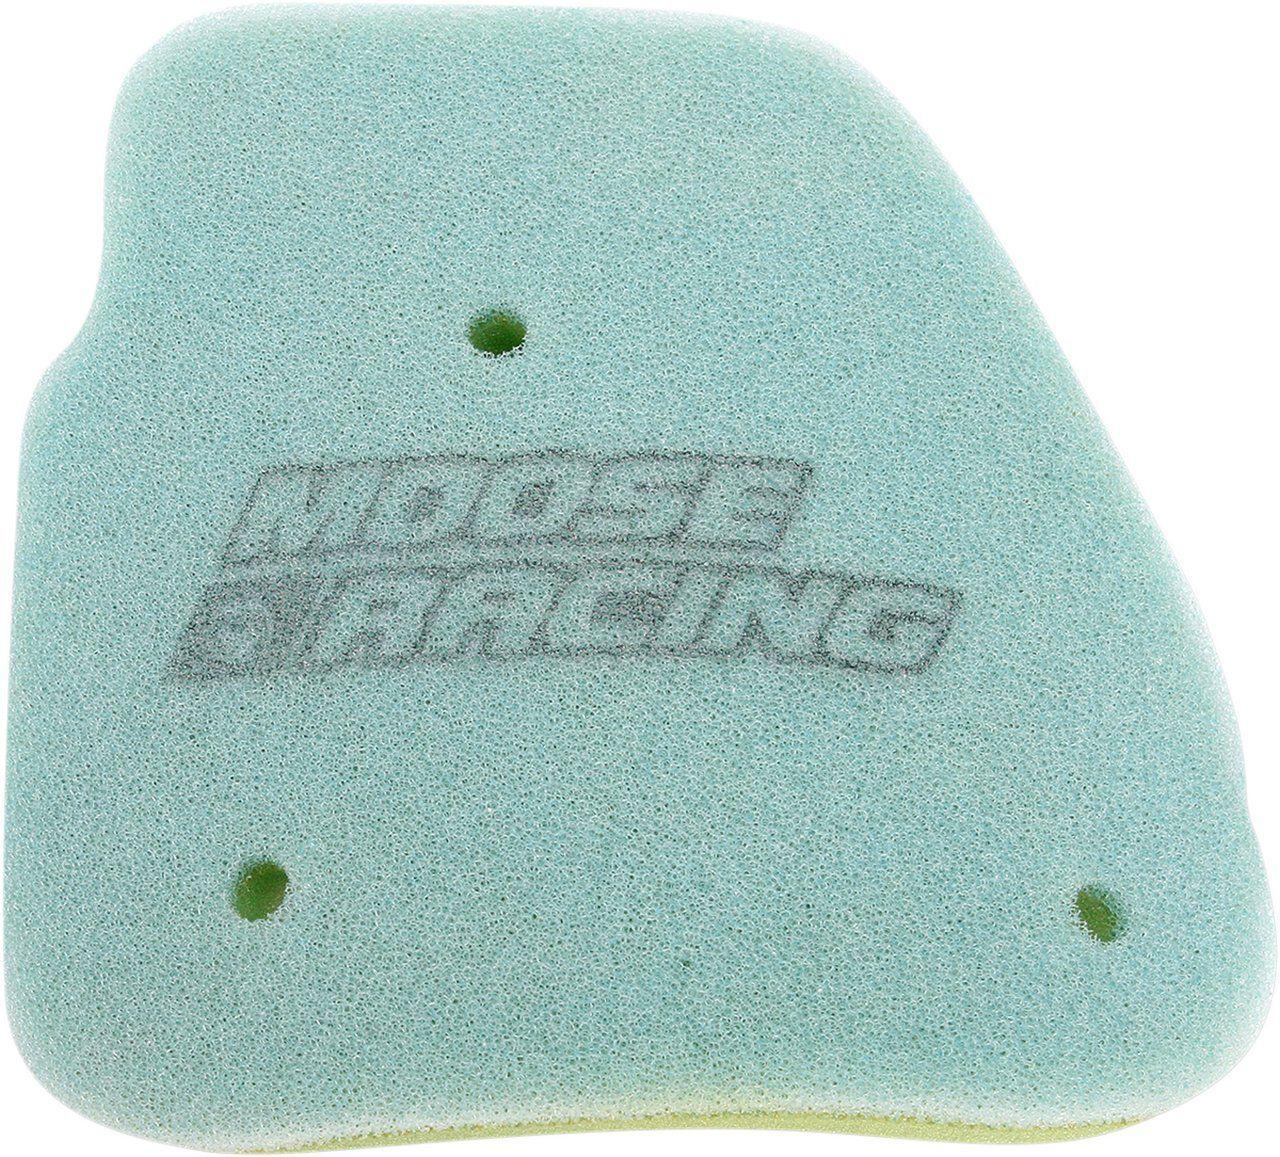 【MOOSE RACING】PPO (PRECISION PRE-OILED) 空氣濾芯 [1011-3125] - 「Webike-摩托百貨」